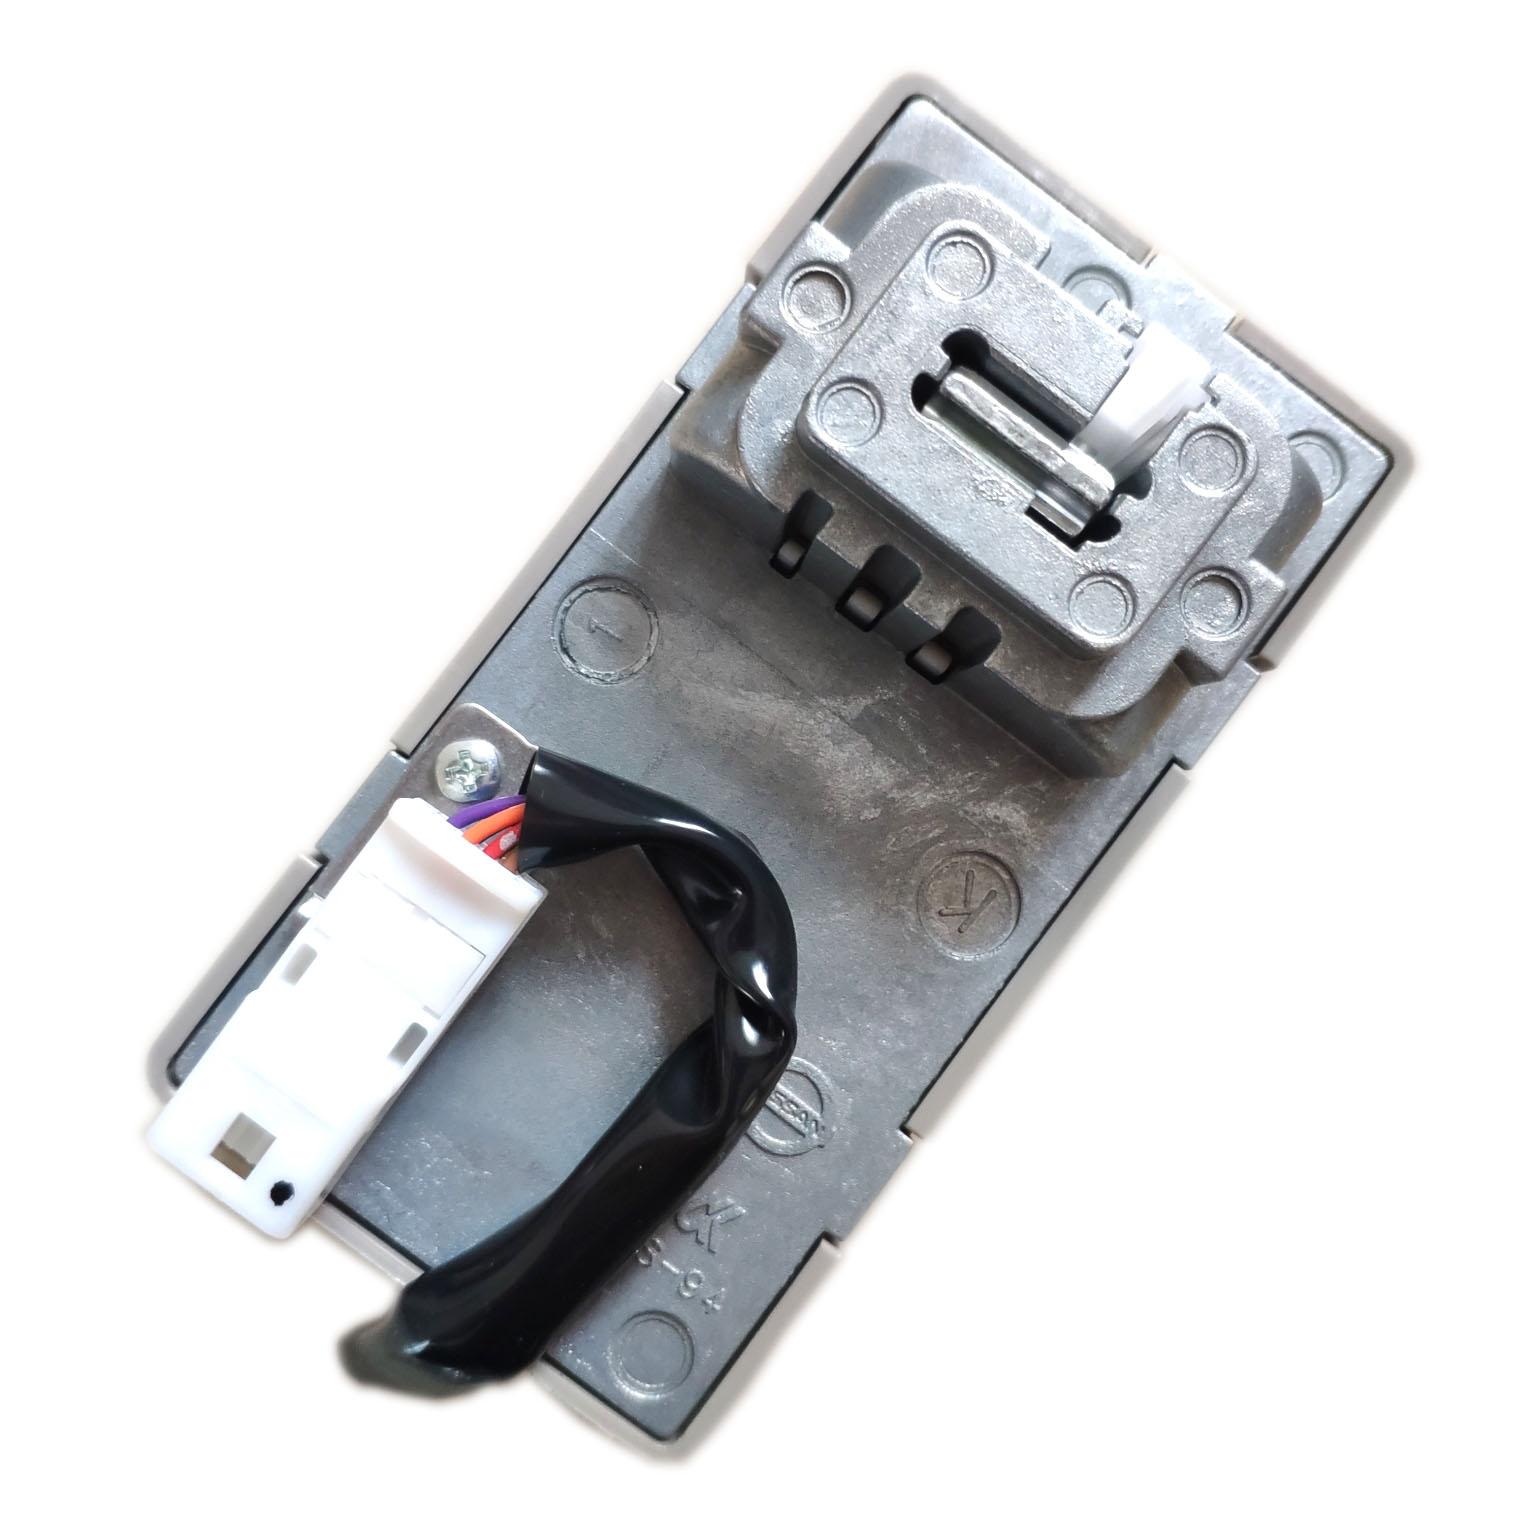 Original  steering wheel lock assembly for Nissan Teana 2008 - 2012